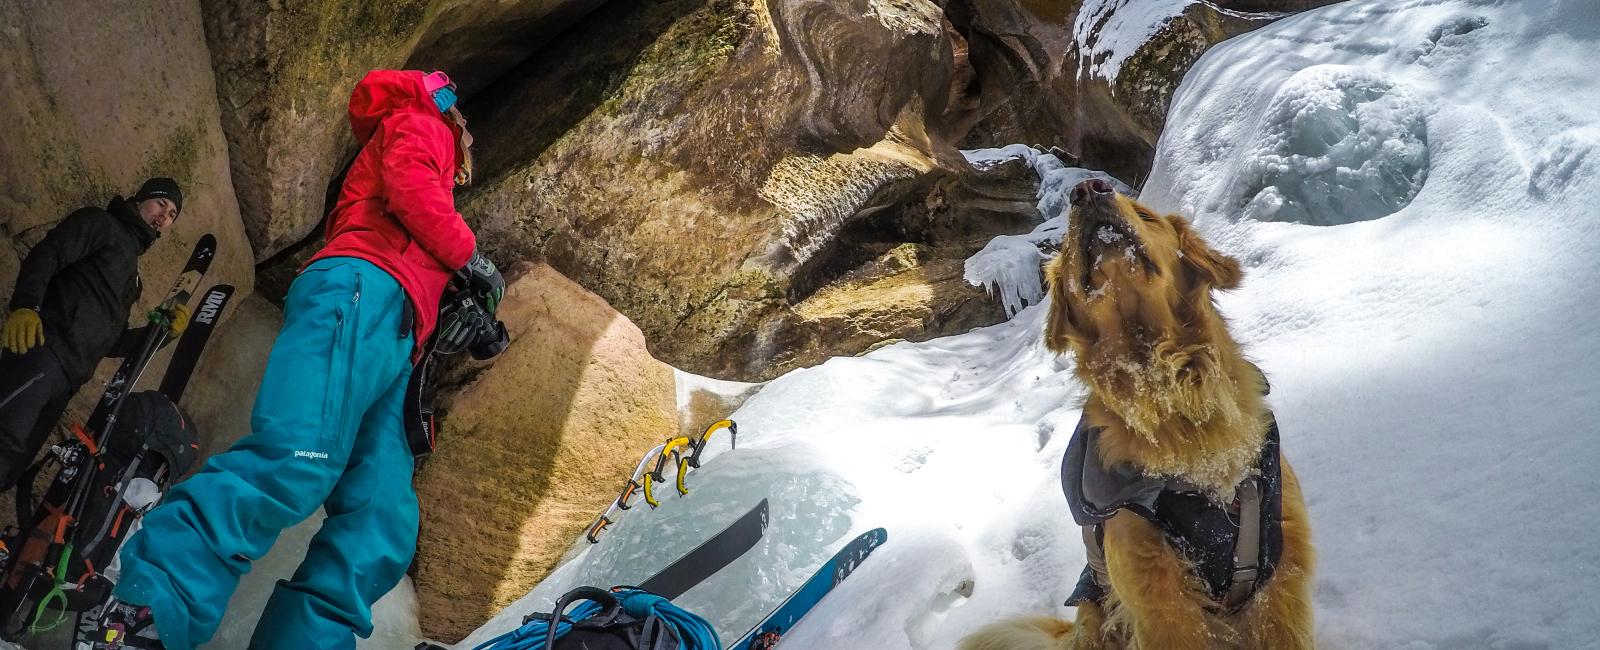 Ice Climbing Through A Utah Slot Canyon With Kicker Dog